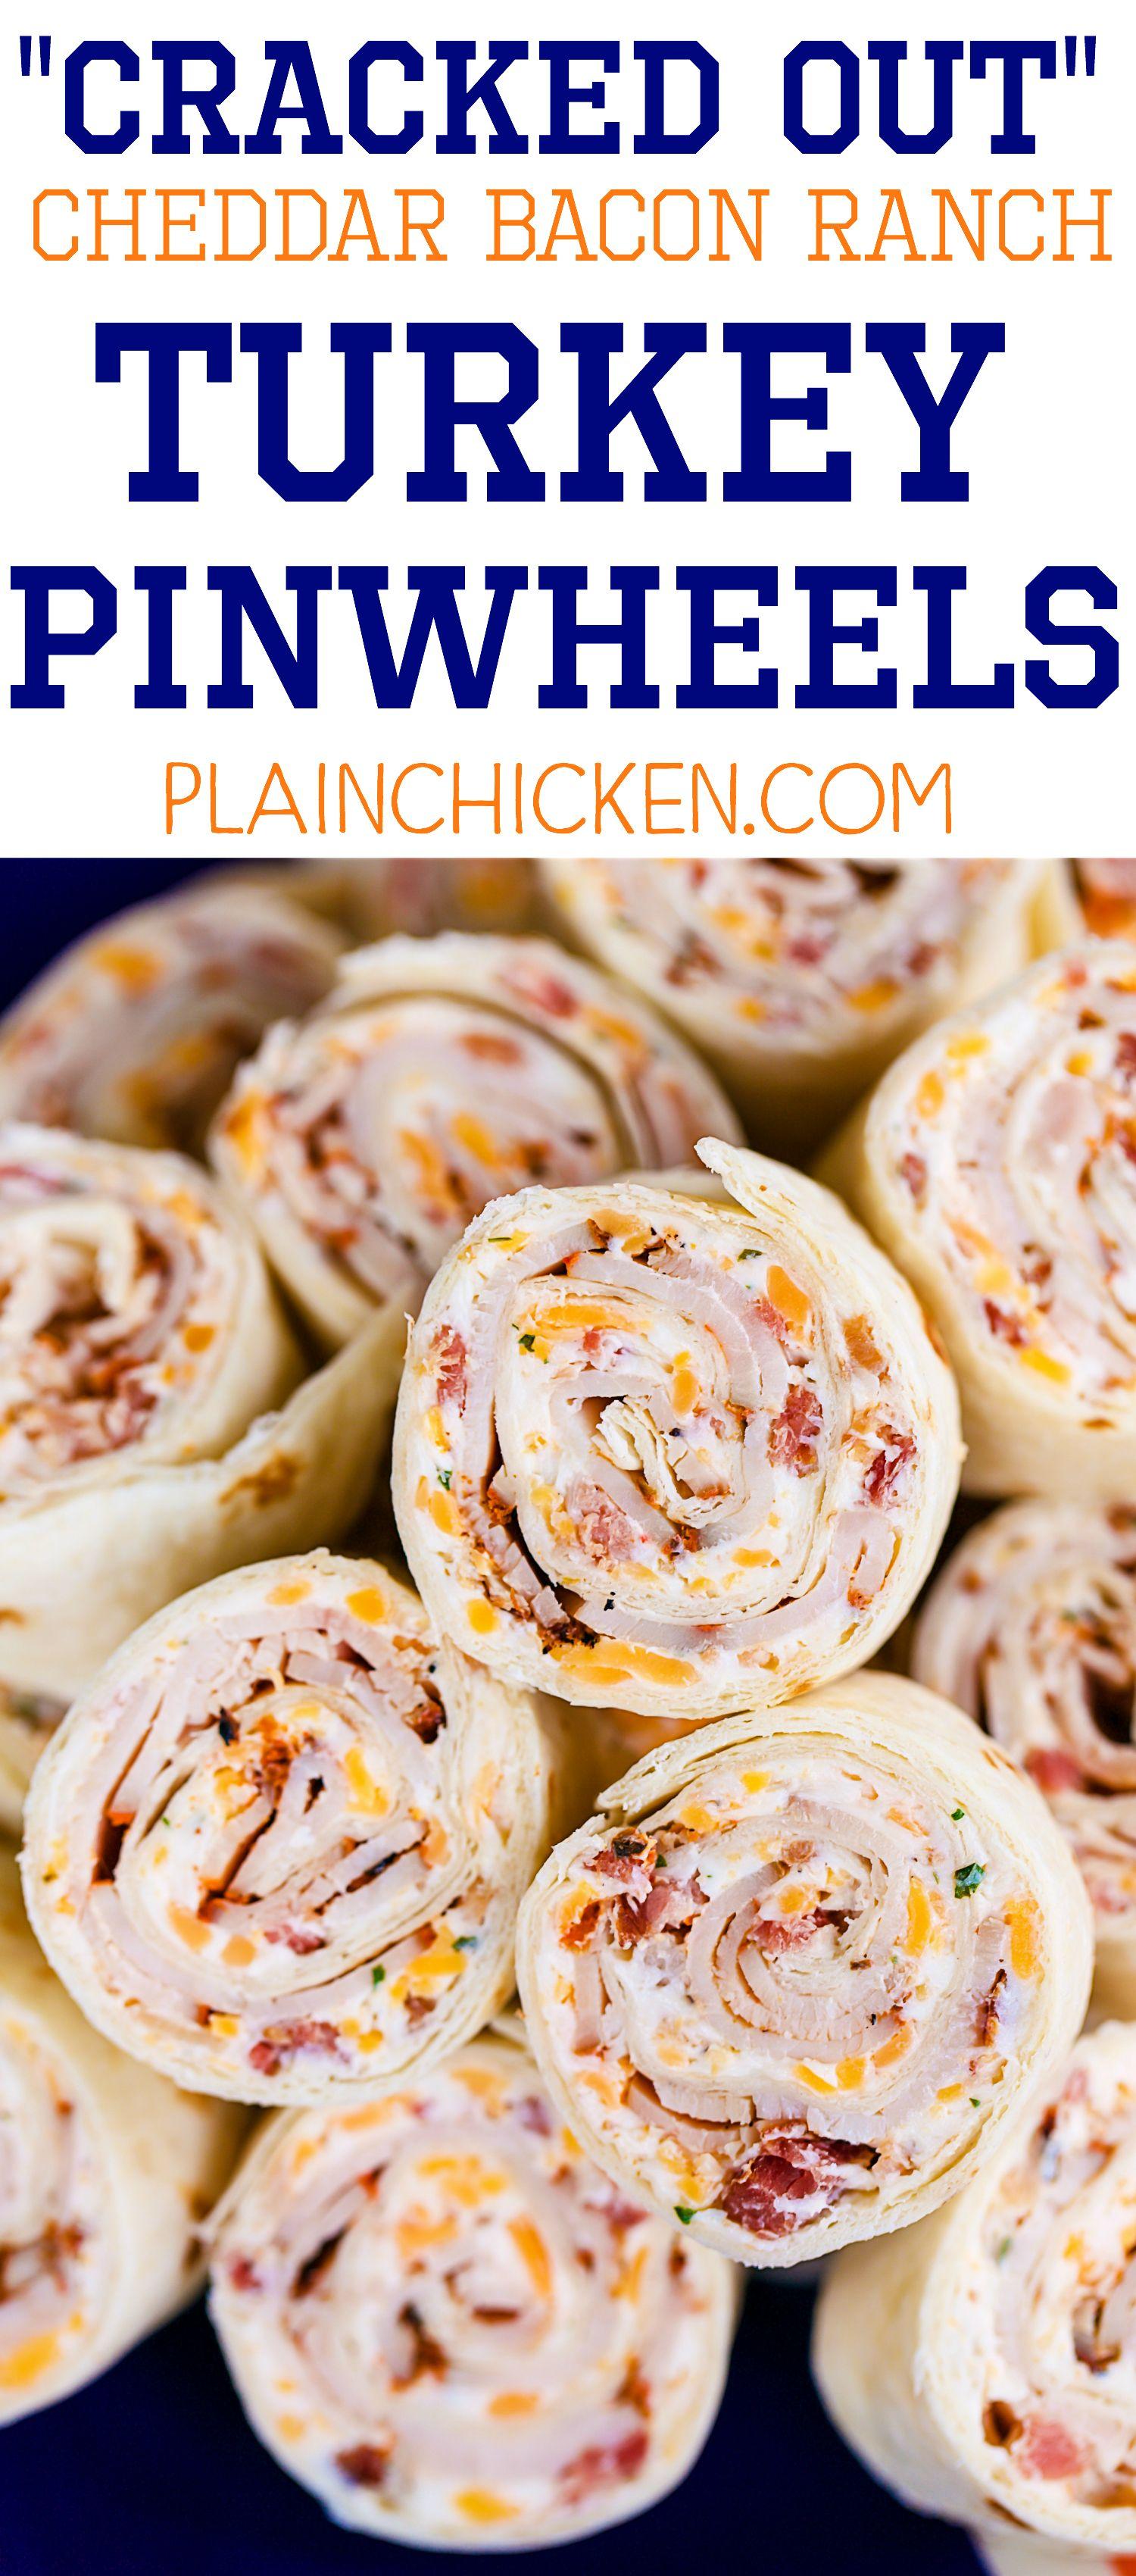 Cracked Out Turkey Pinwheels {Football Friday} - Plain Chicken